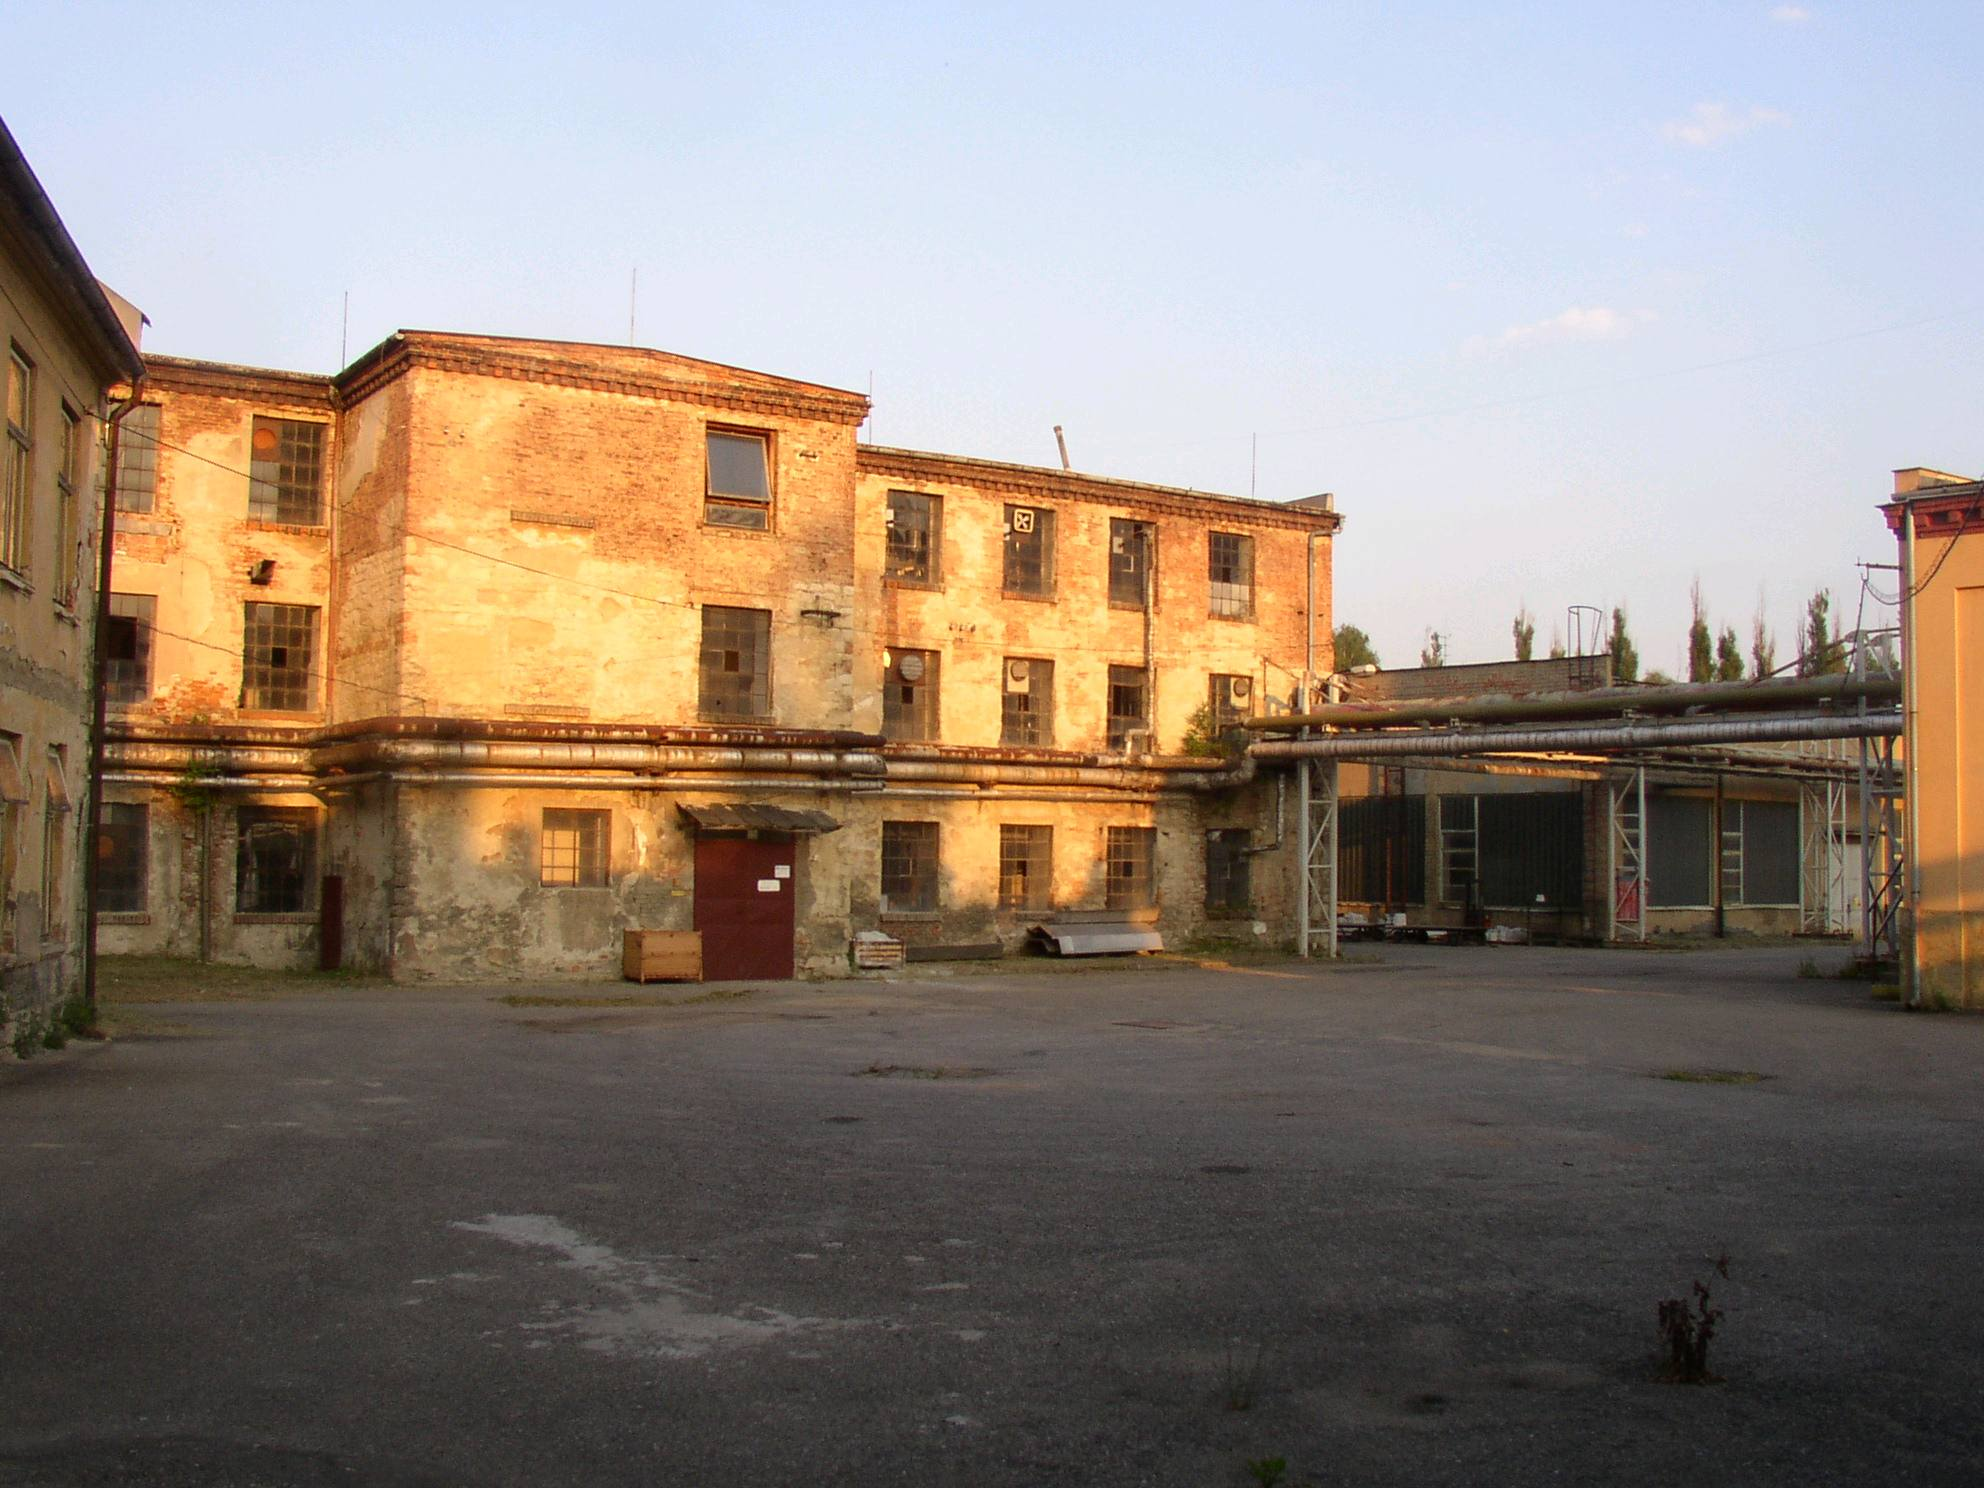 File:Schindlers factory Brnenec CZ 2004b.JPG